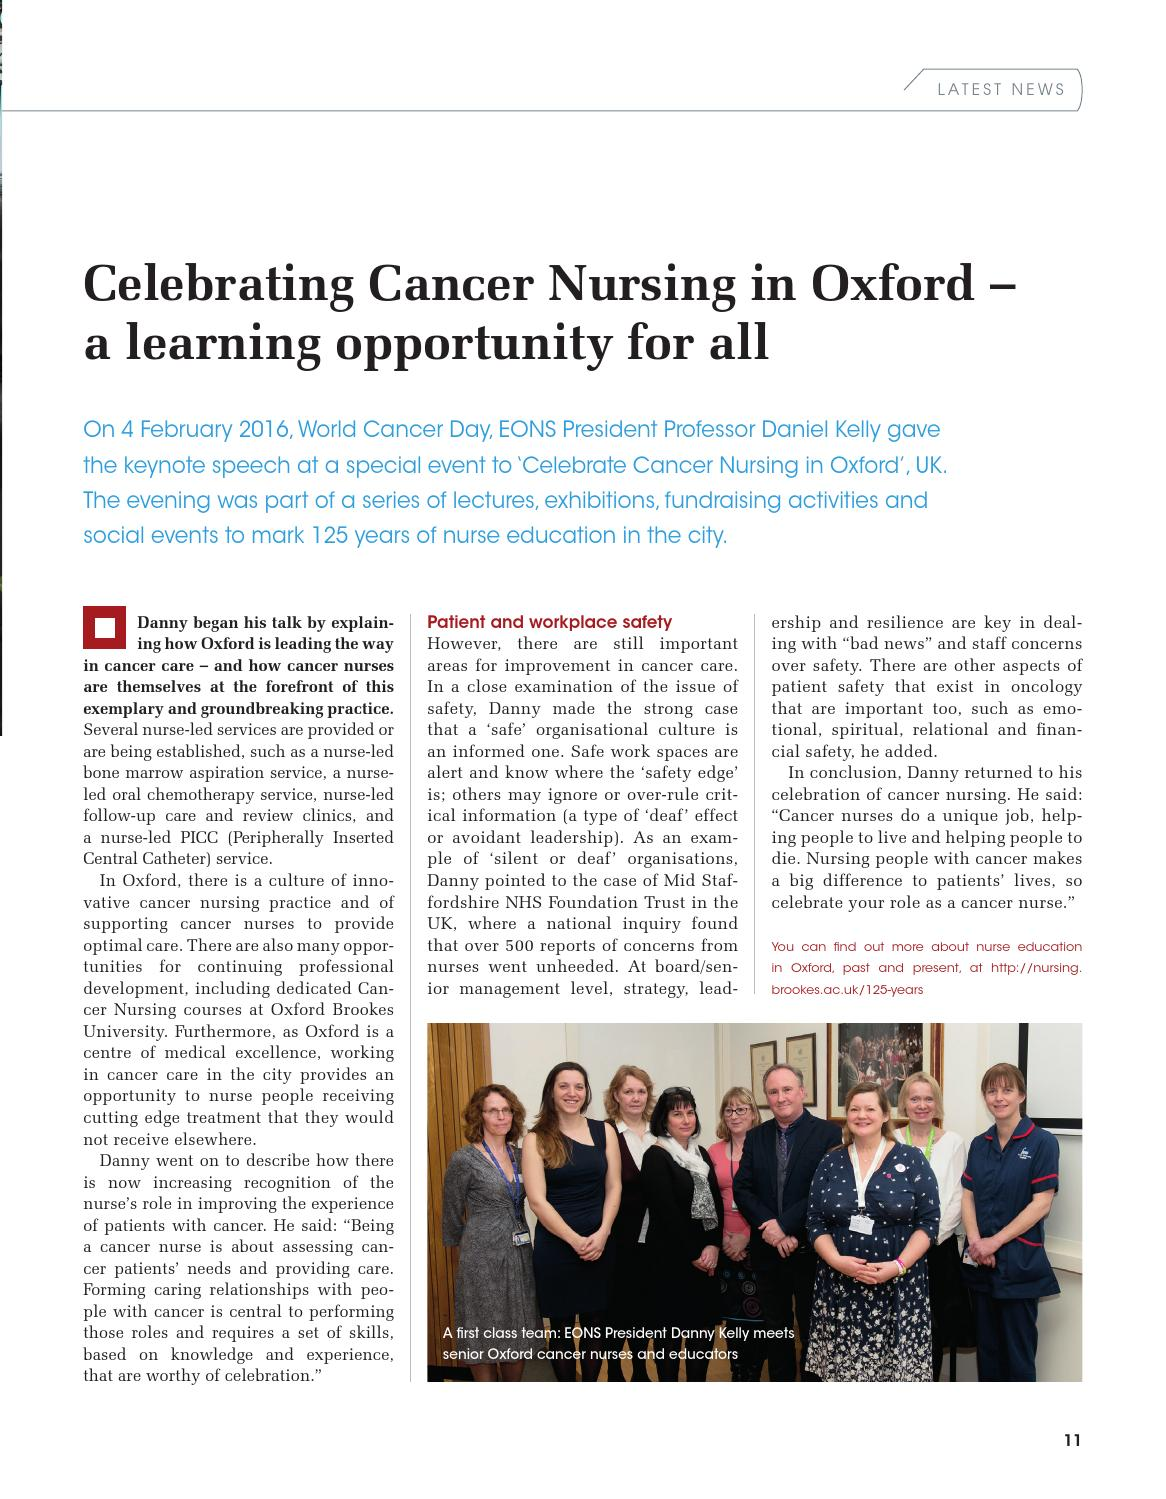 EONS (European Oncology Nursing Society) Magazine Spring